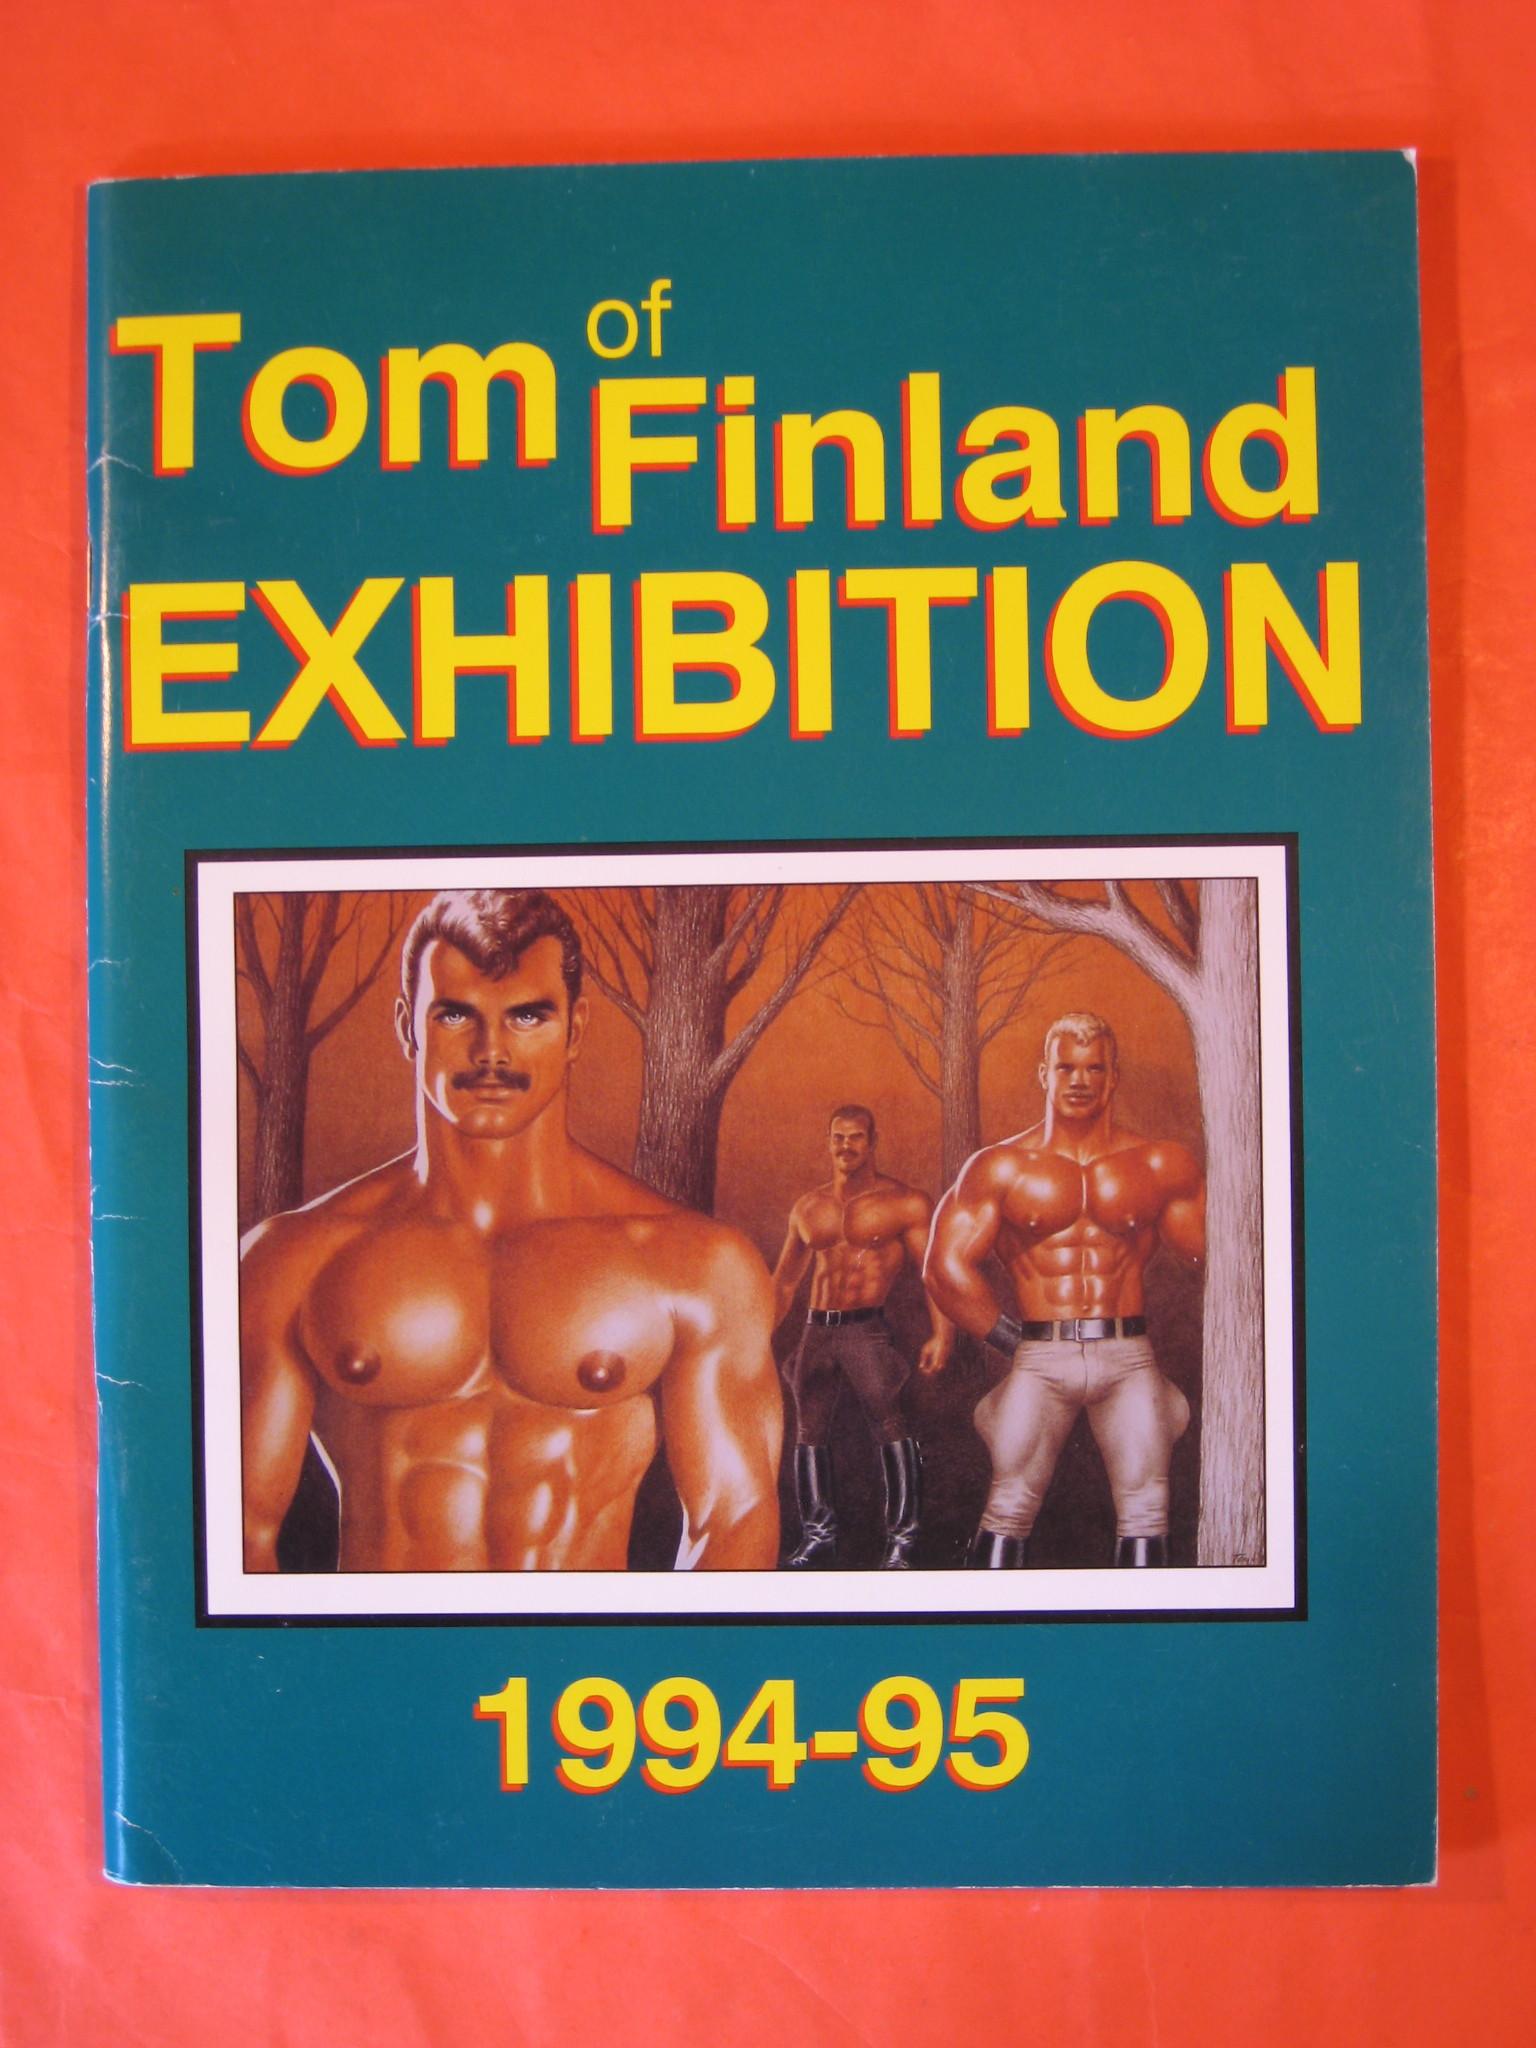 Tom of Finland Exhibition 1994-95, Finland, Tom; Touko